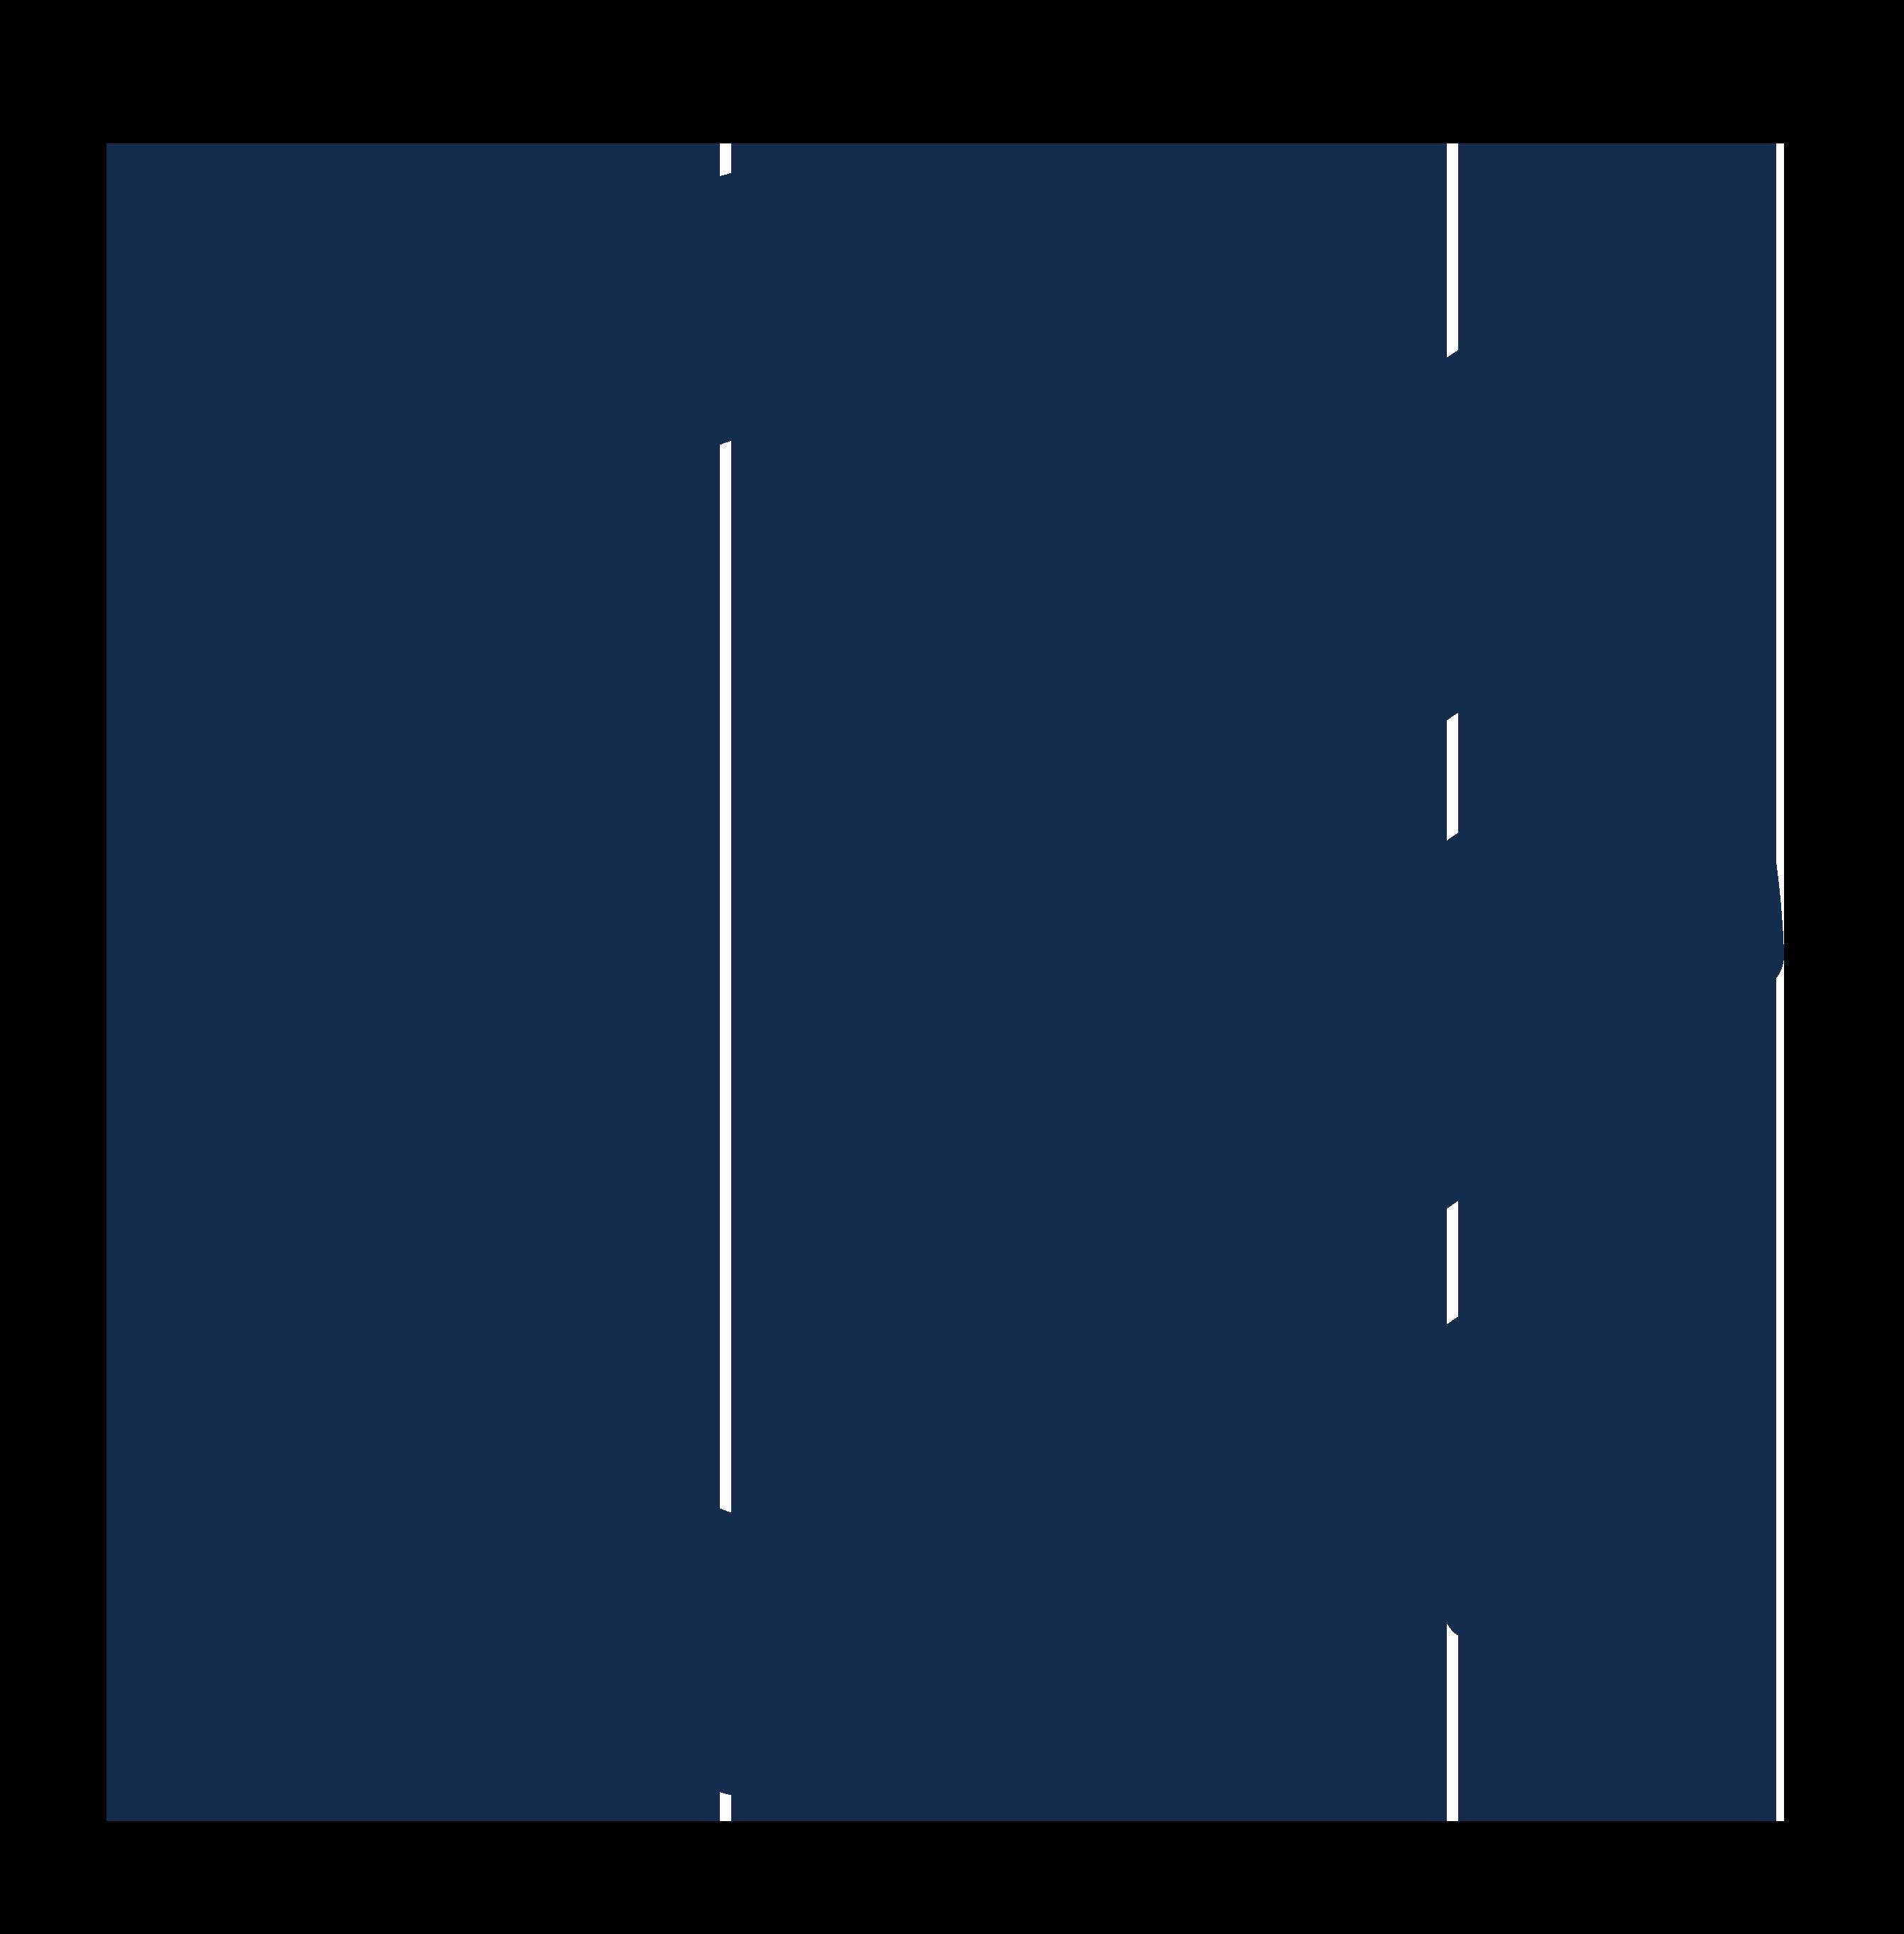 Curve's logo